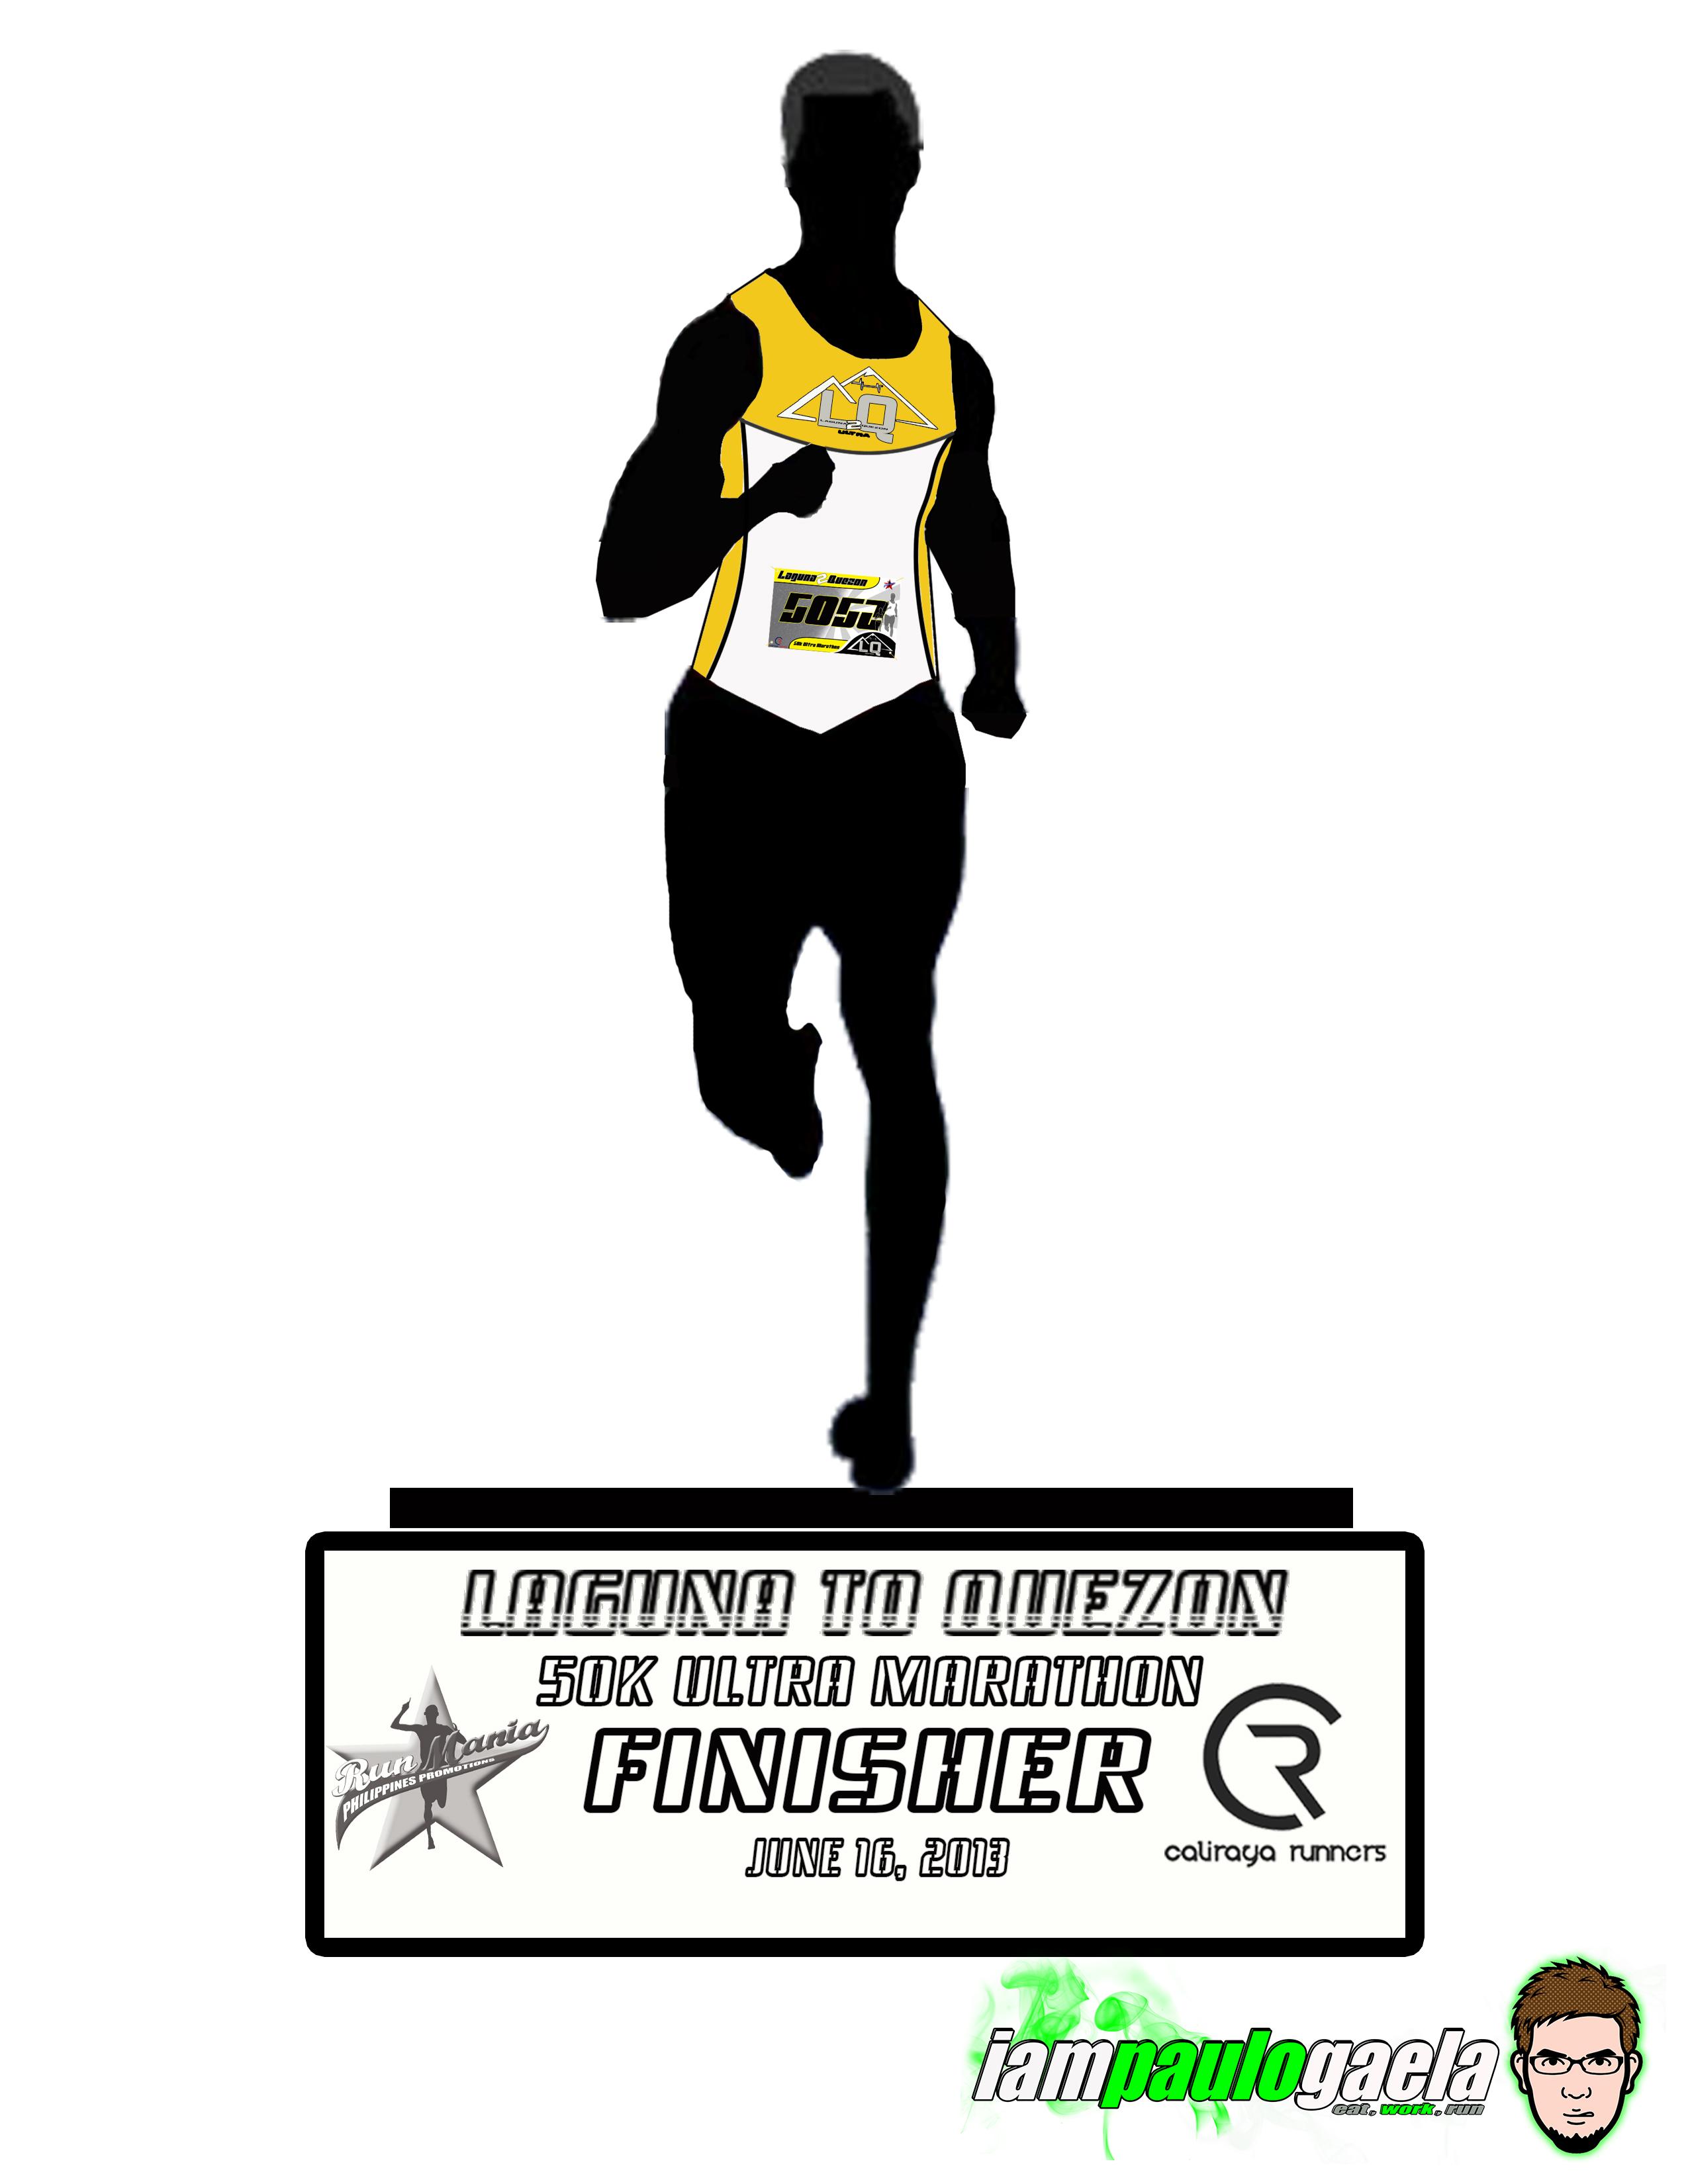 laguna-to-quezon-50k-ultra-marathon-2013-trophy-design